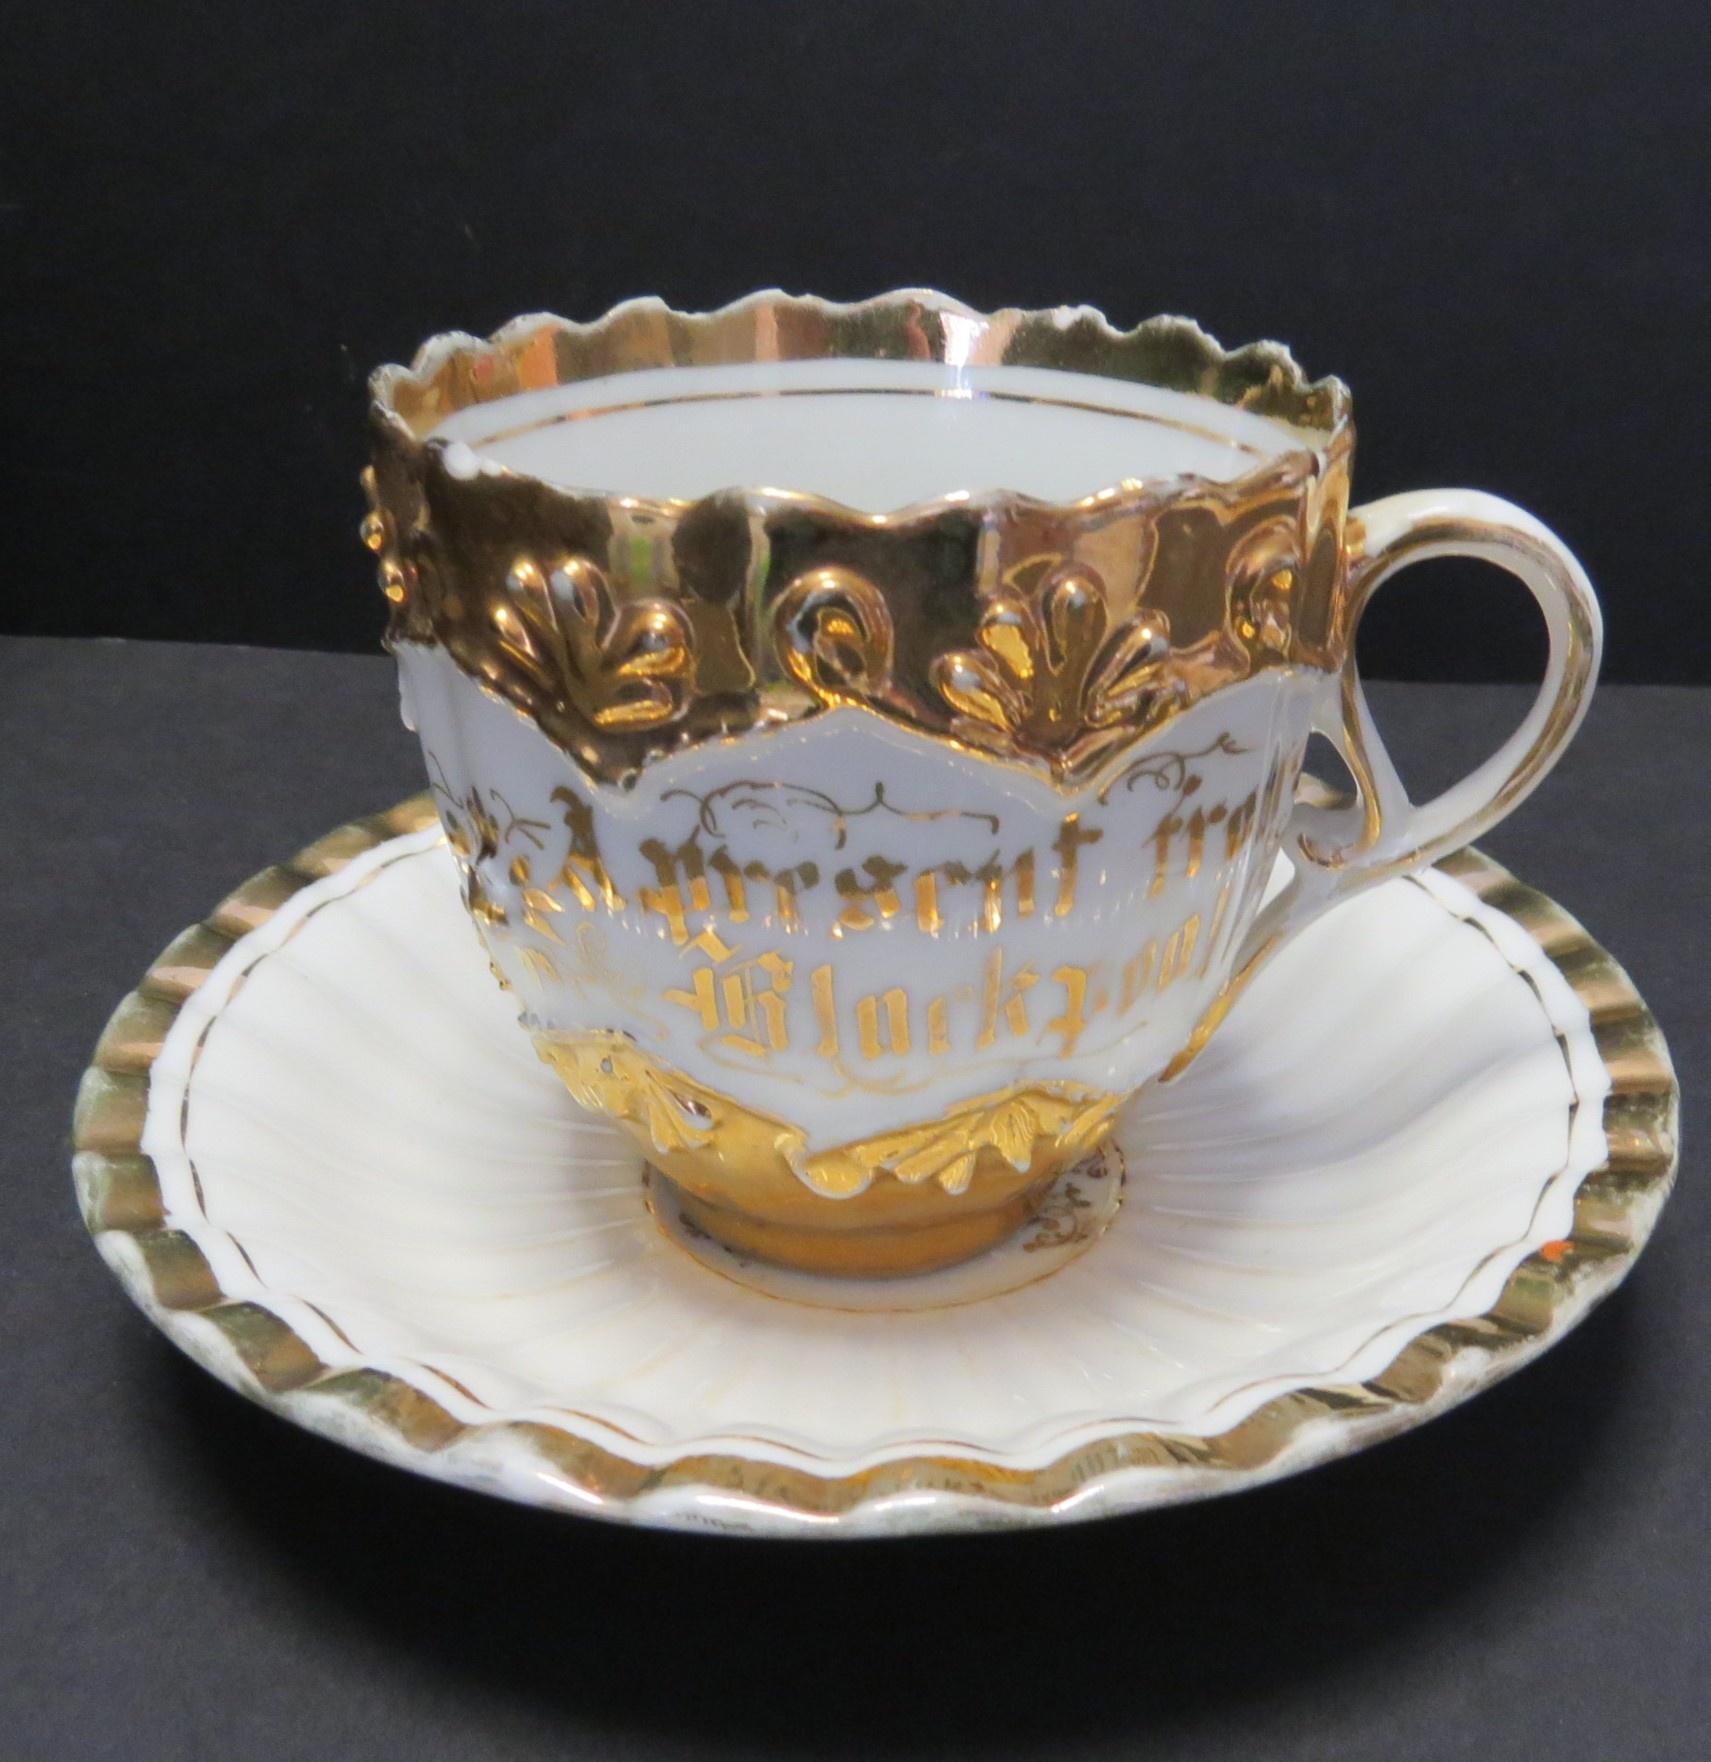 Collectible Vintage 1930s  Small Pearlised Souvenir of Blackpool Mug